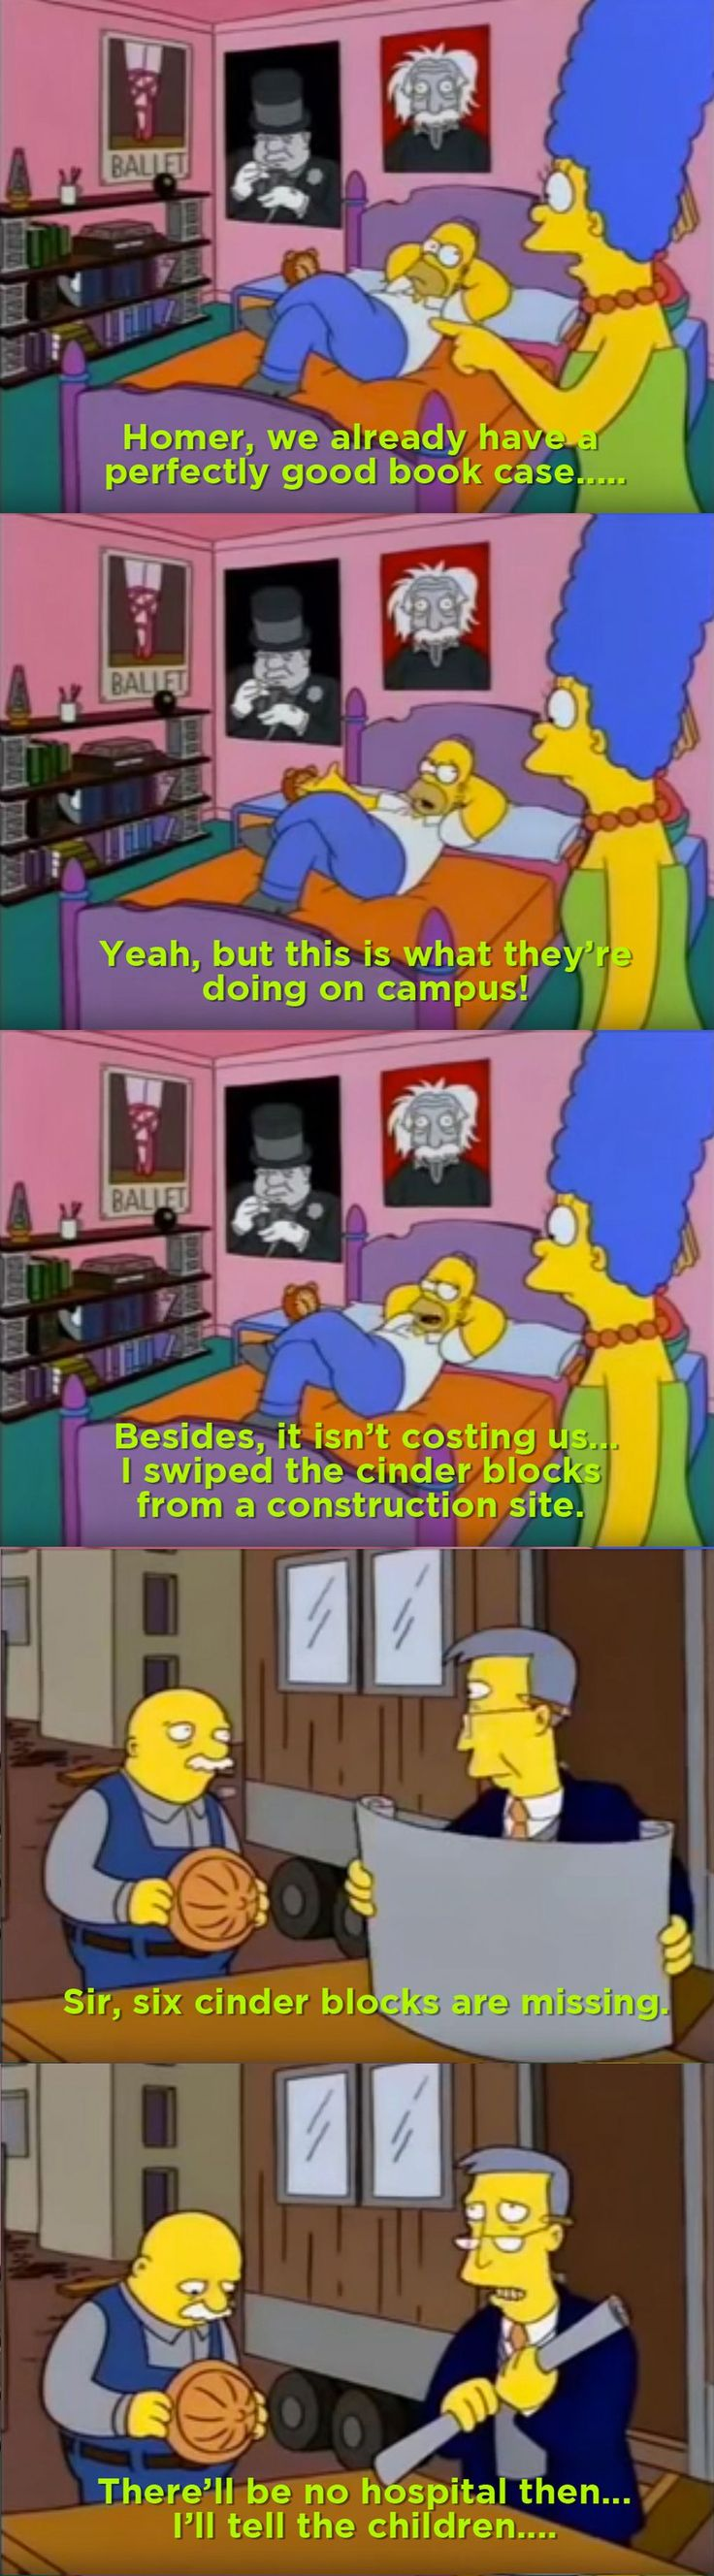 Homer's dorm room inspired furniture